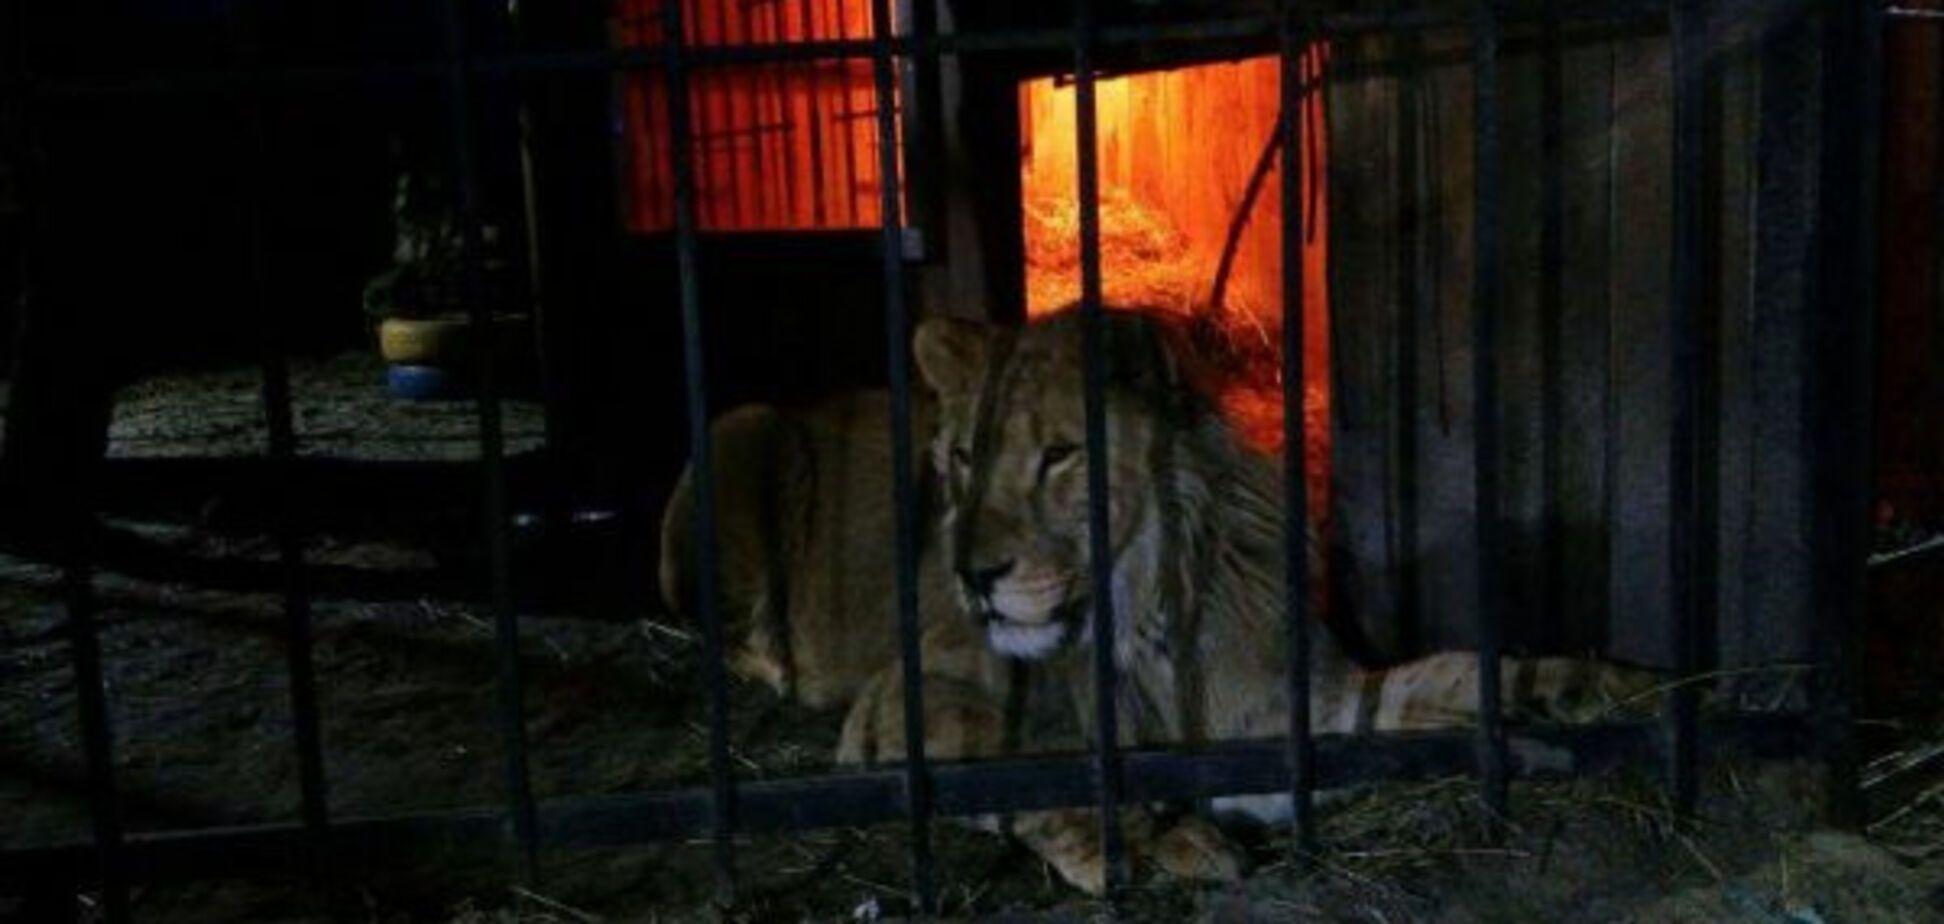 Отдыхающего в запорожской бане едва не разорвал лев (ФОТО)